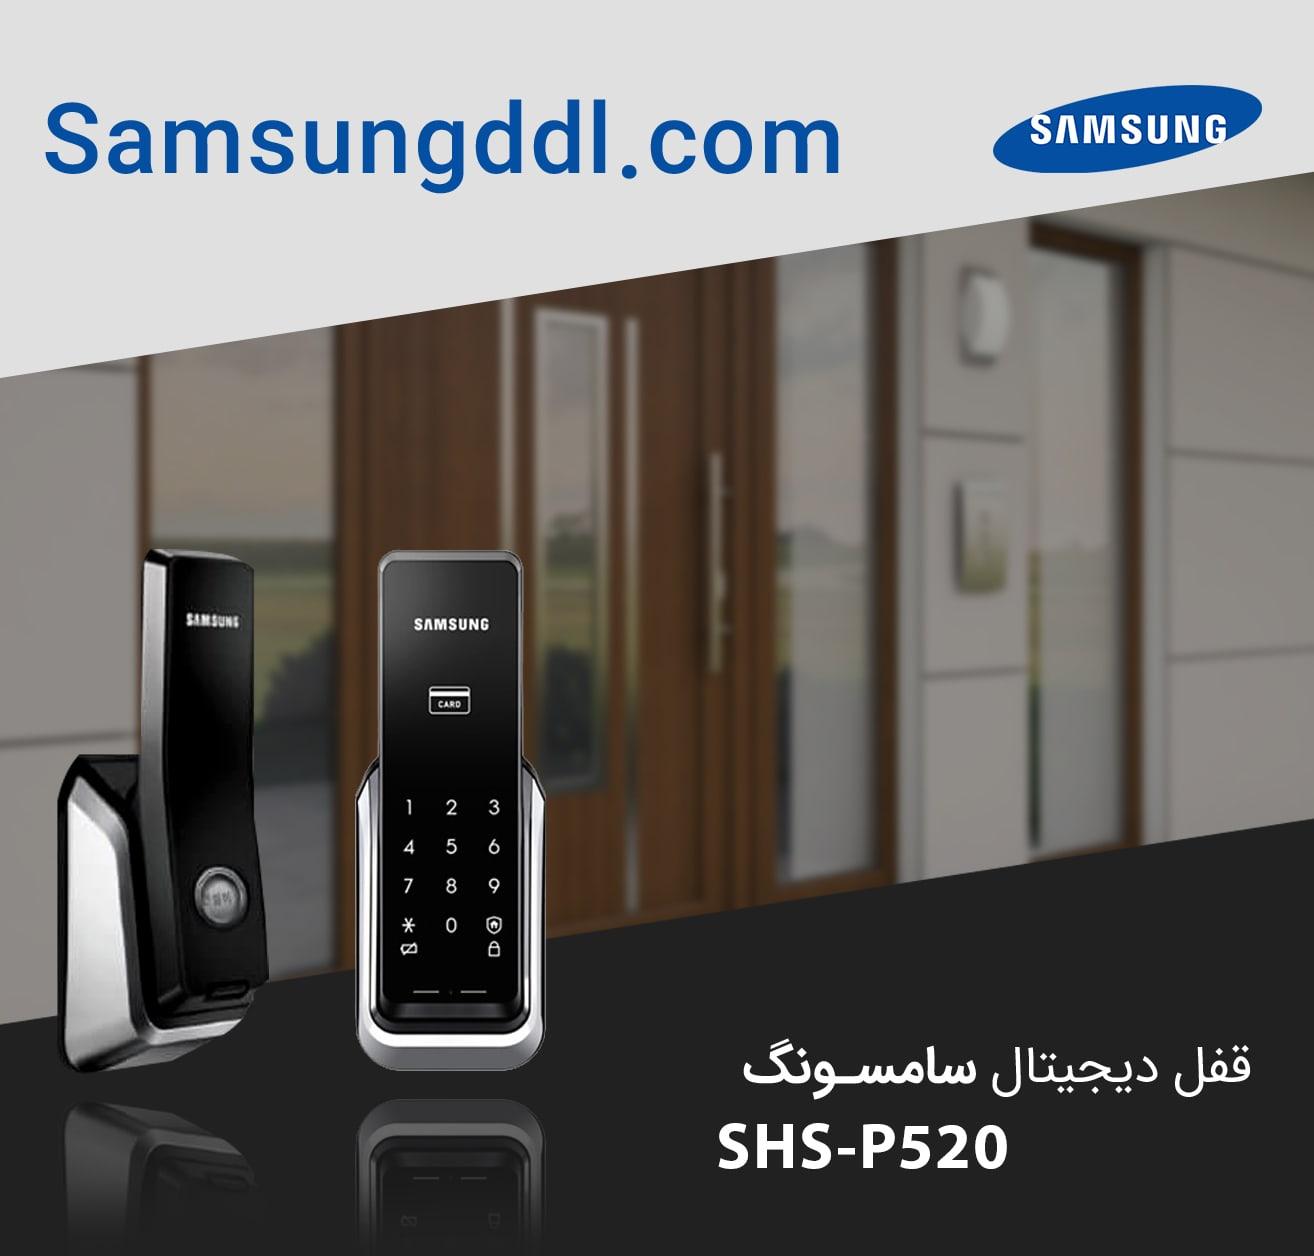 samsung-P520